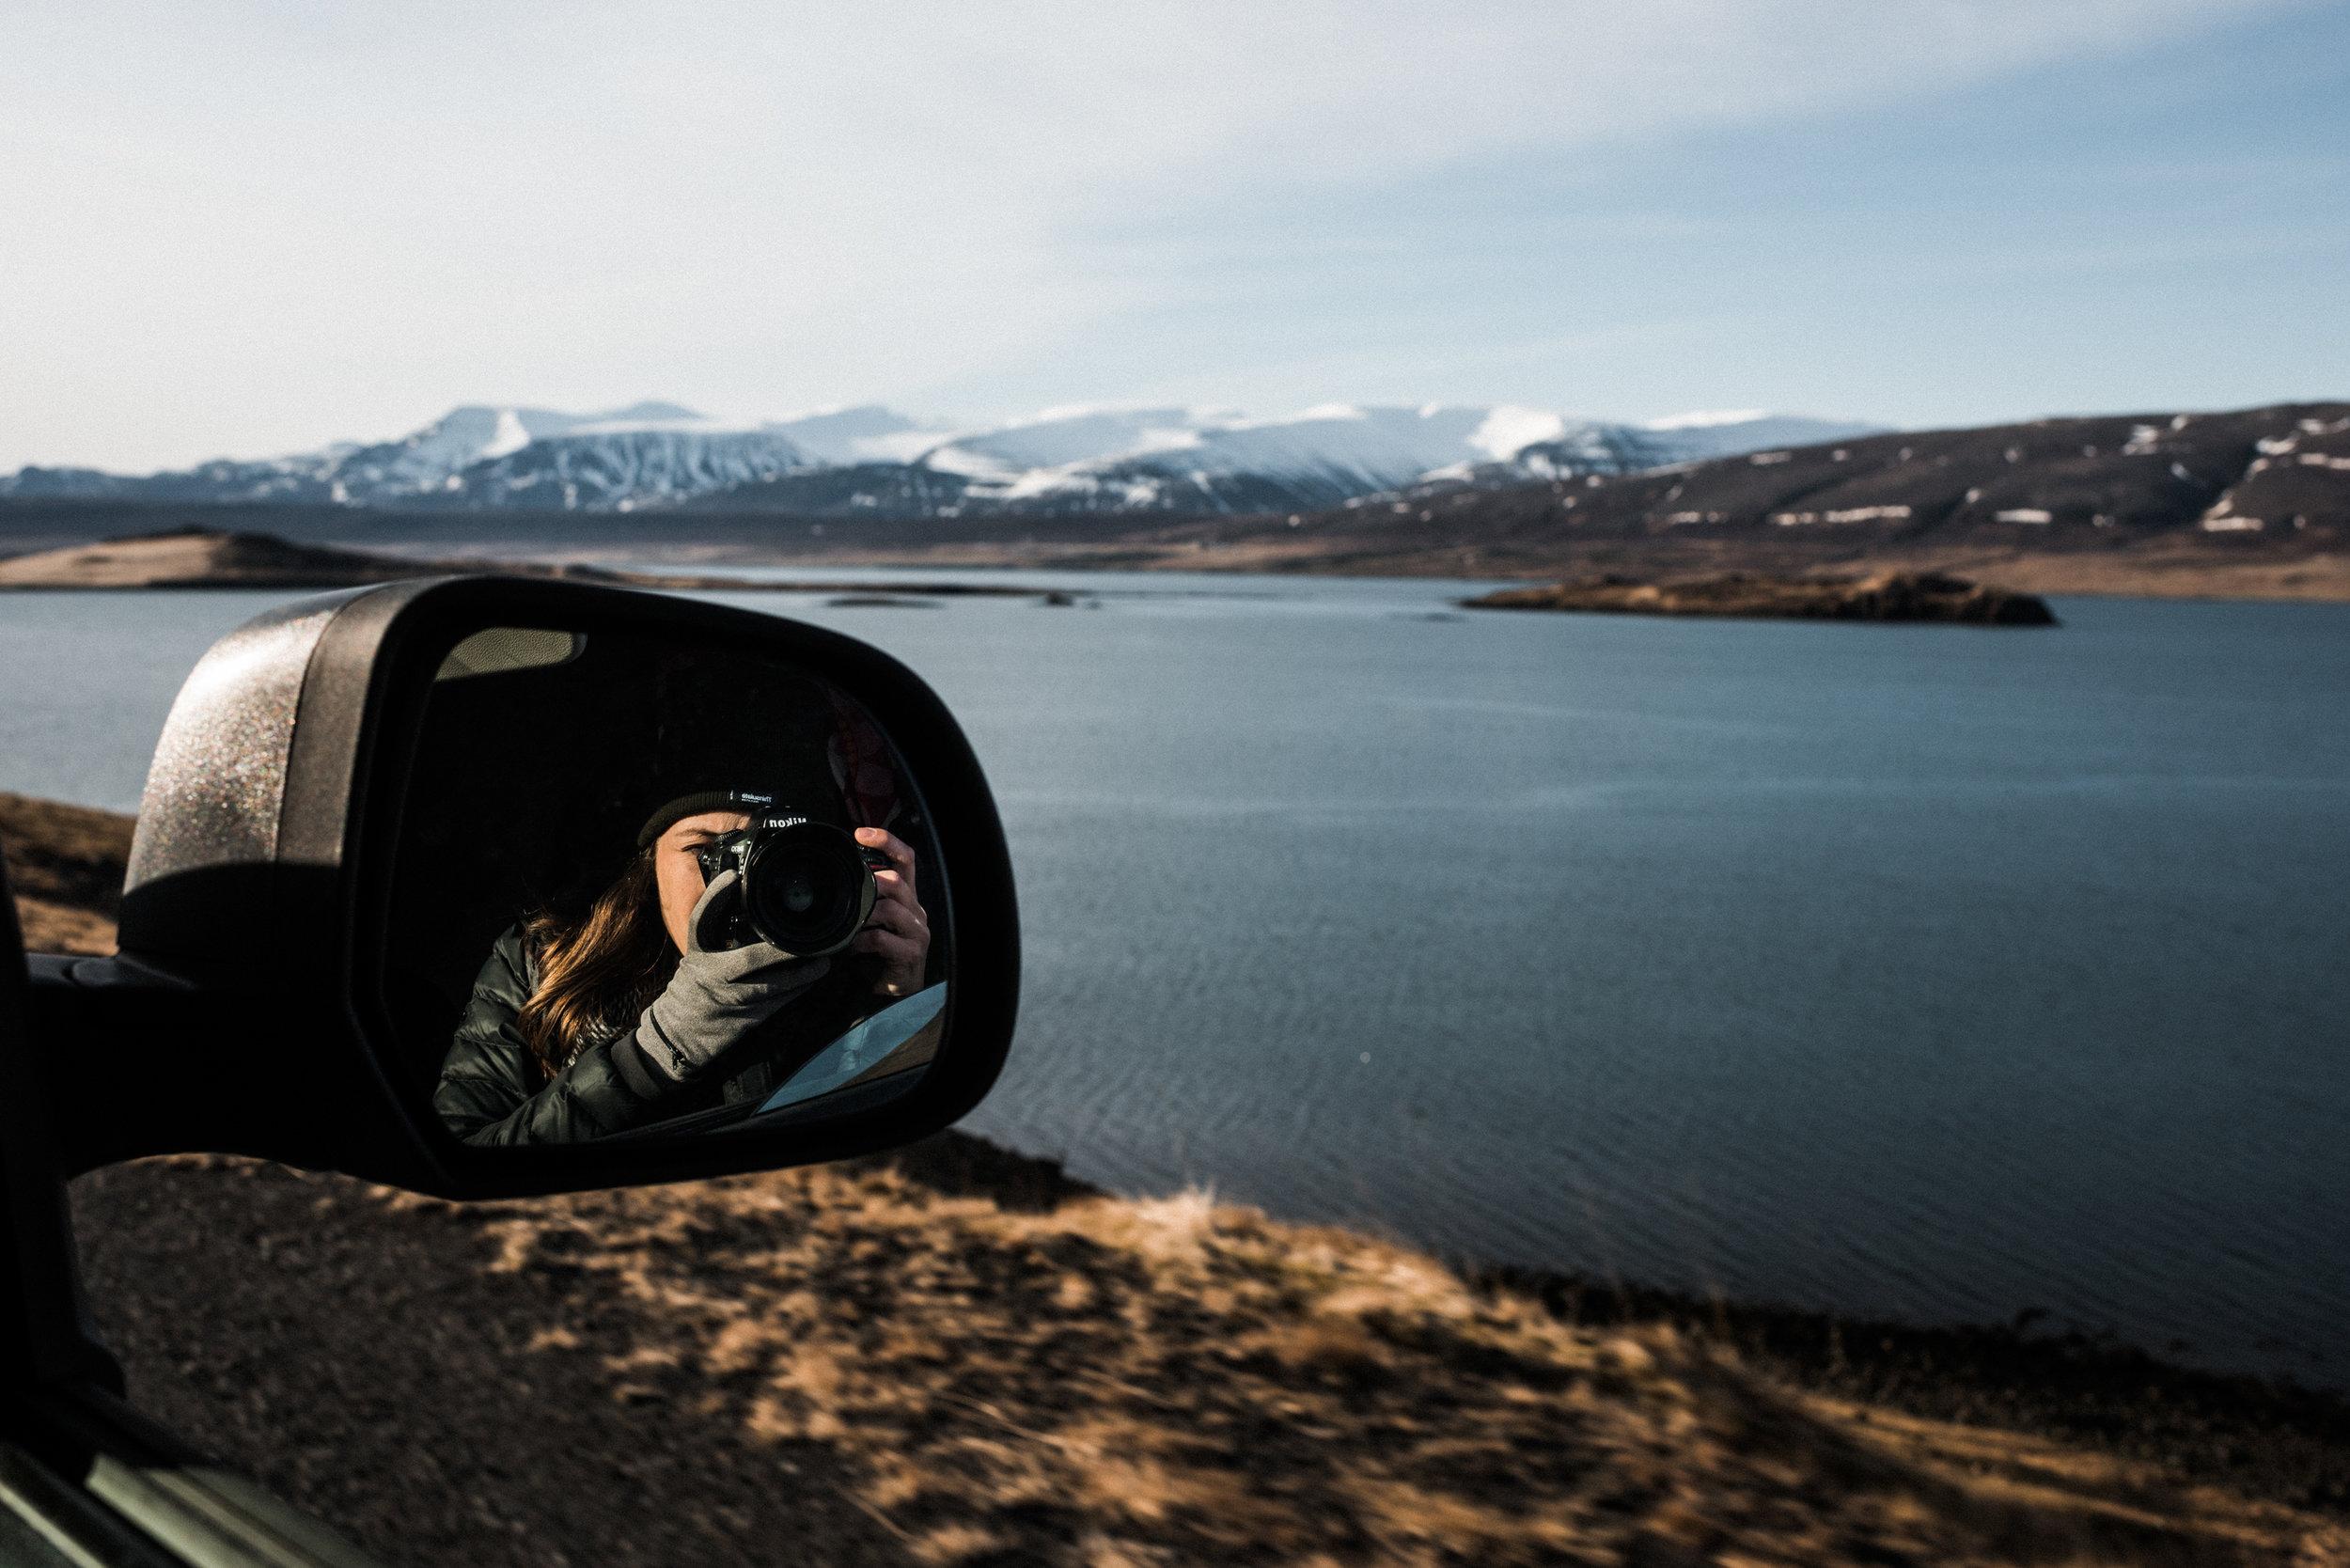 ICELAND_WOMAN_PHOTOGRAPHER_TARASHUPE_OUTDOOR_PHOTOGRAPHY_157.jpg